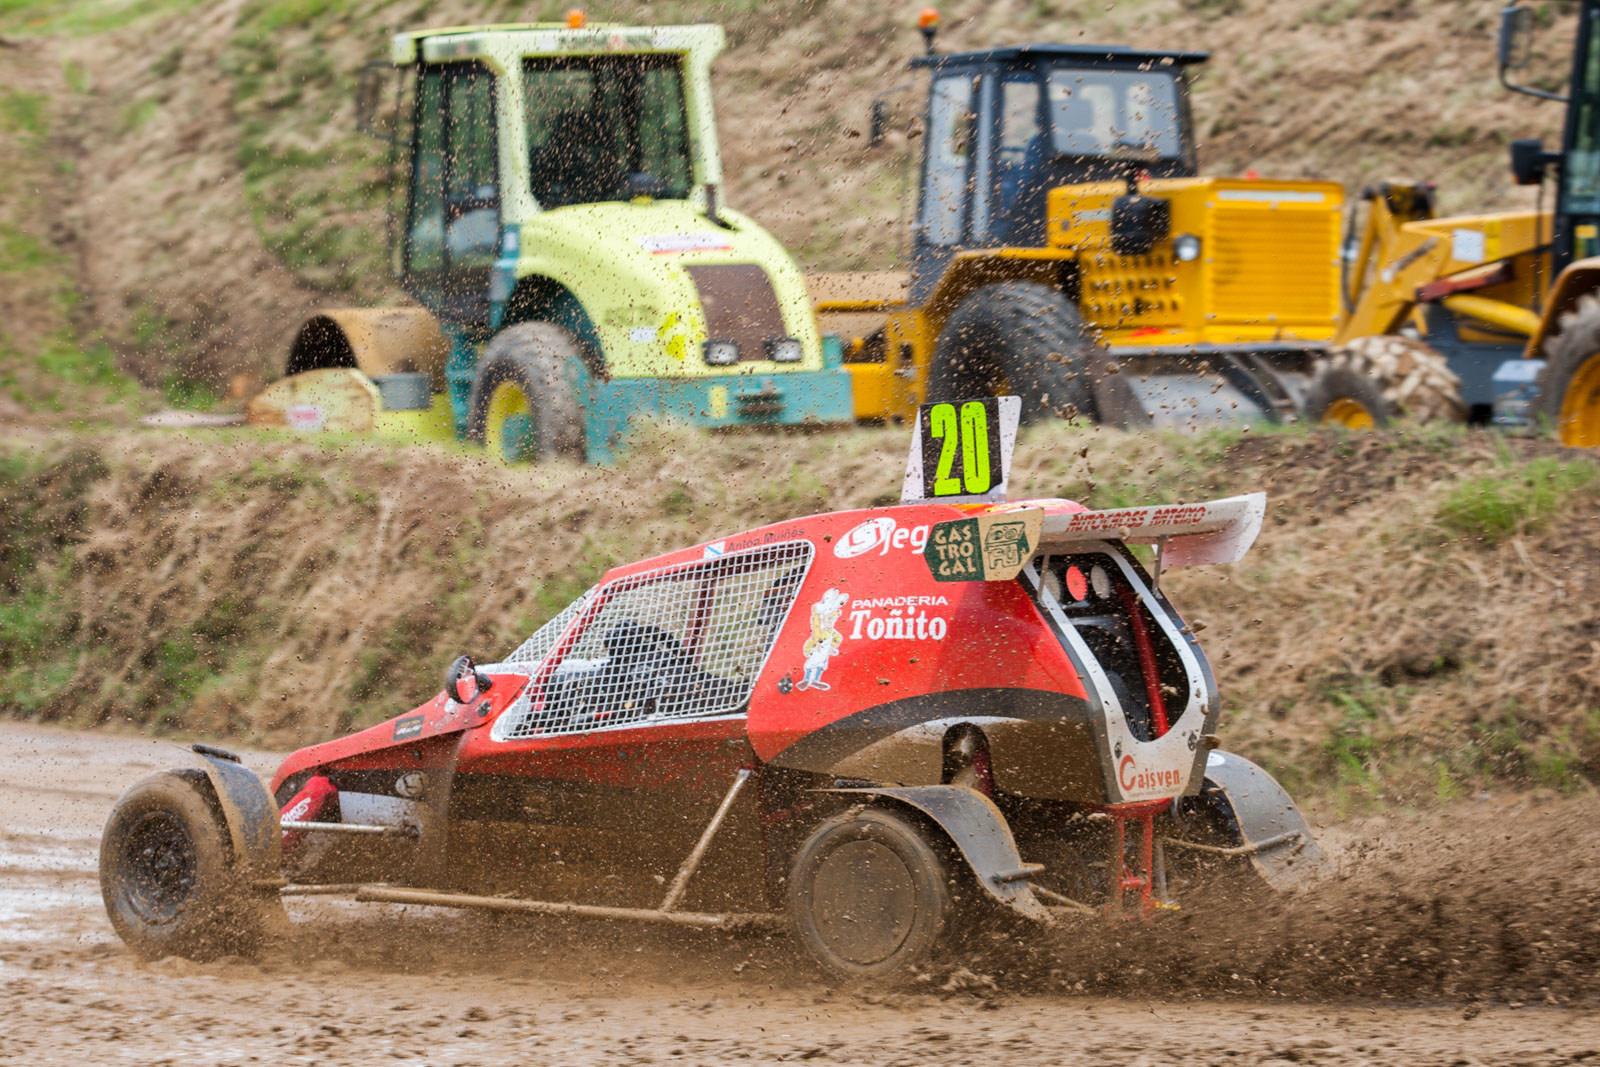 005 Autocross Carballo FGA 2016 010